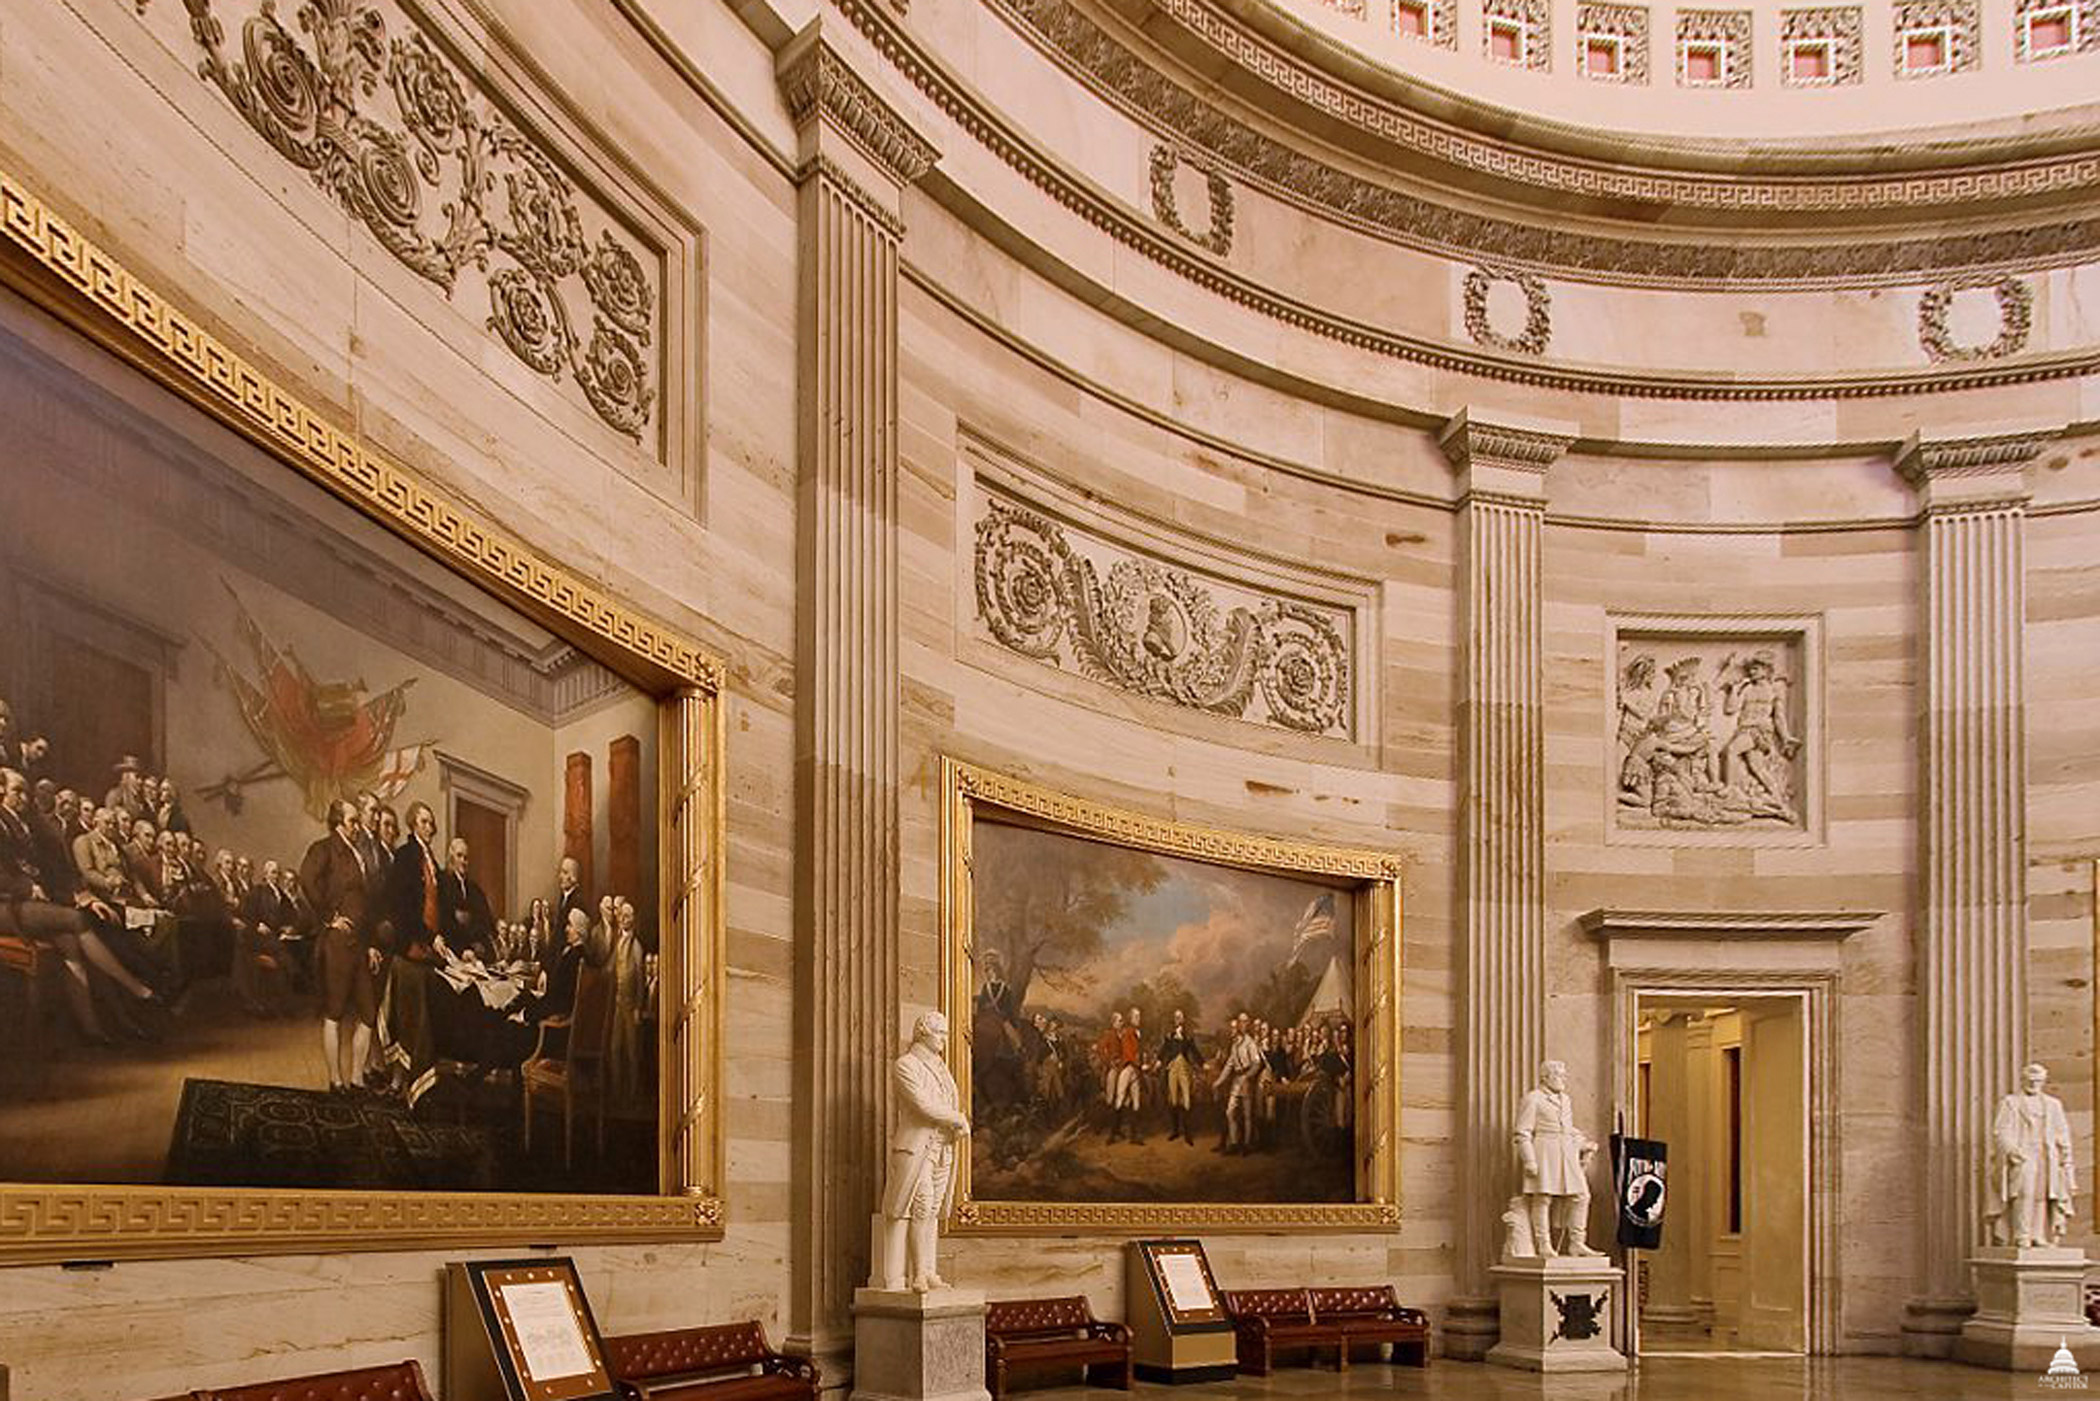 The sandstone walls of the U.S. Capitol Rotunda rise 48 feet above the floor, circa 2011.